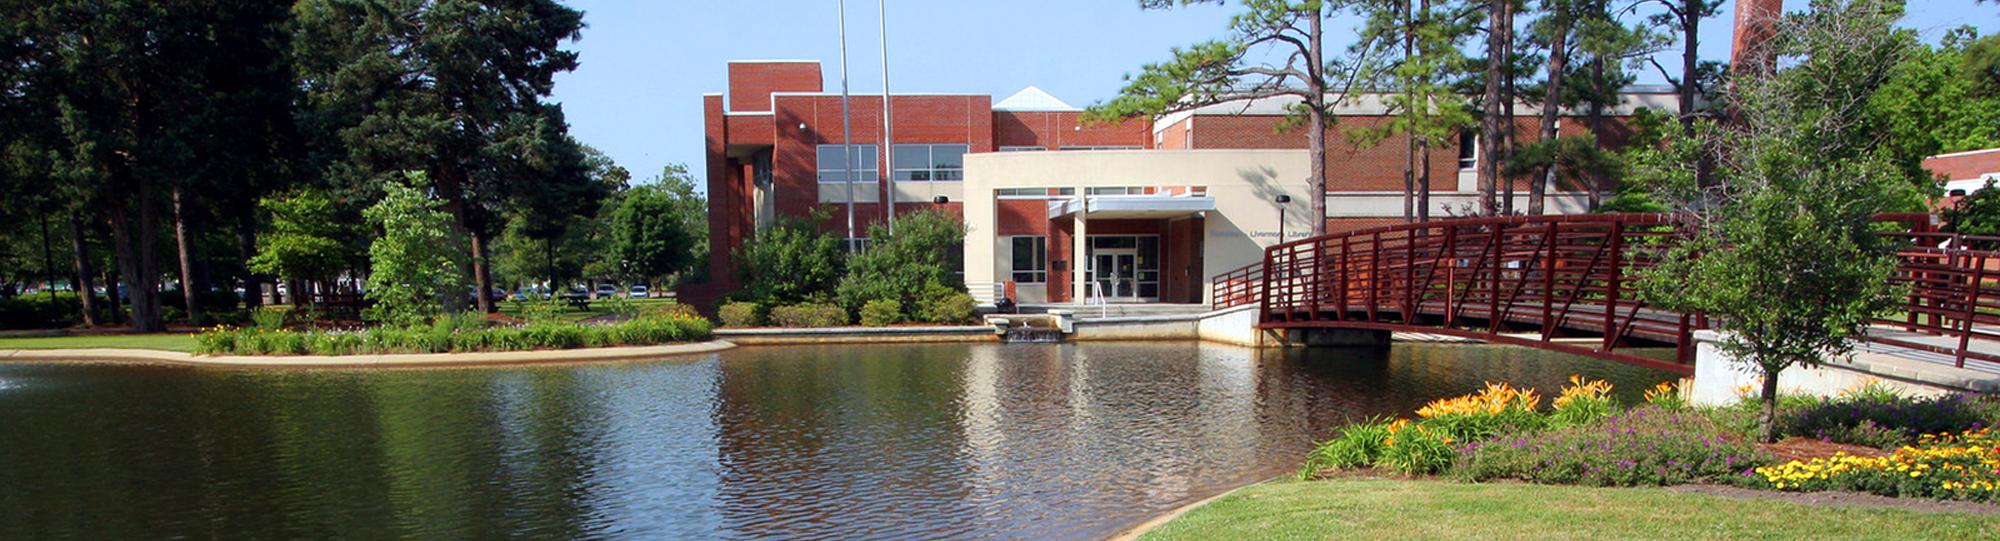 Lake in school